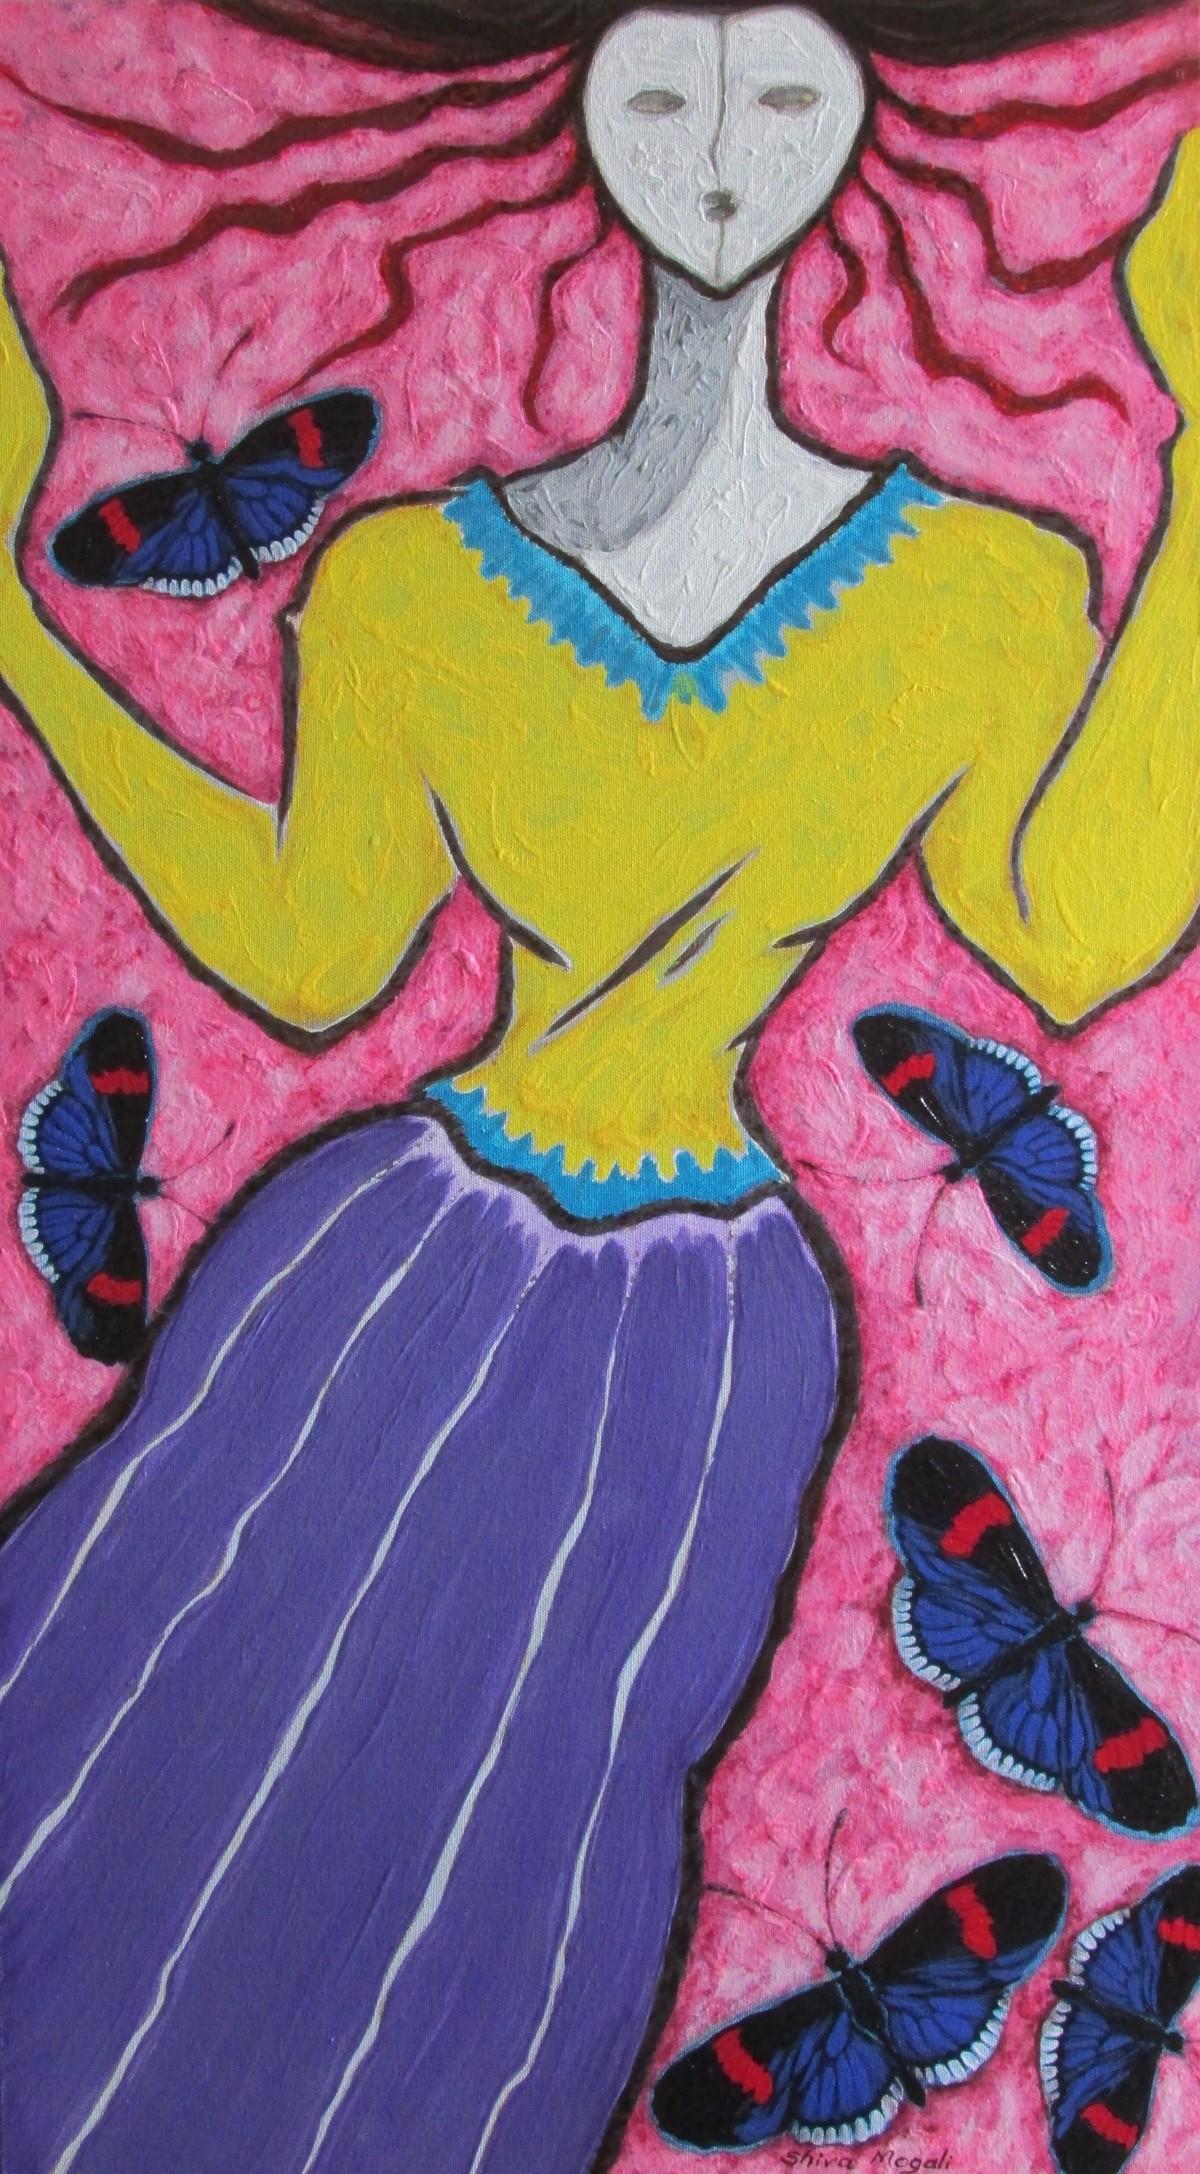 A Girl with Black Butterflies Digital Print by Shivayogi Mogali,Expressionism